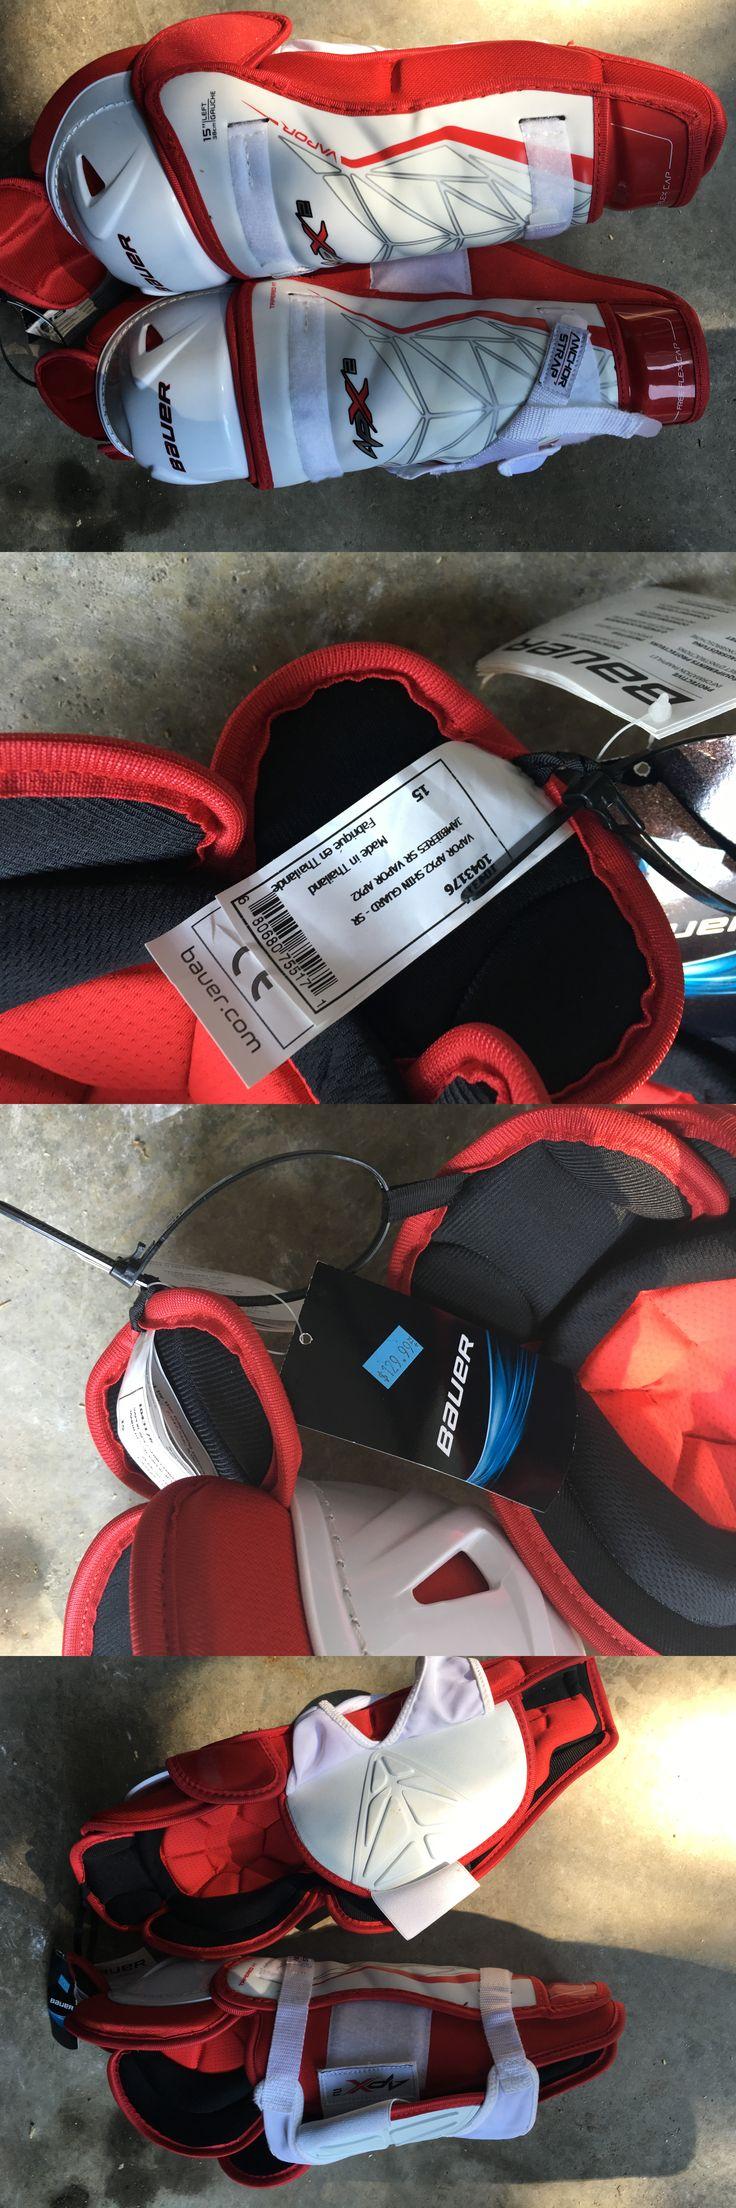 Helmets 20854: Bauer Vapor Apx2 Hockey Shin Pads - Senior Size 15 -> BUY IT NOW ONLY: $80 on eBay!